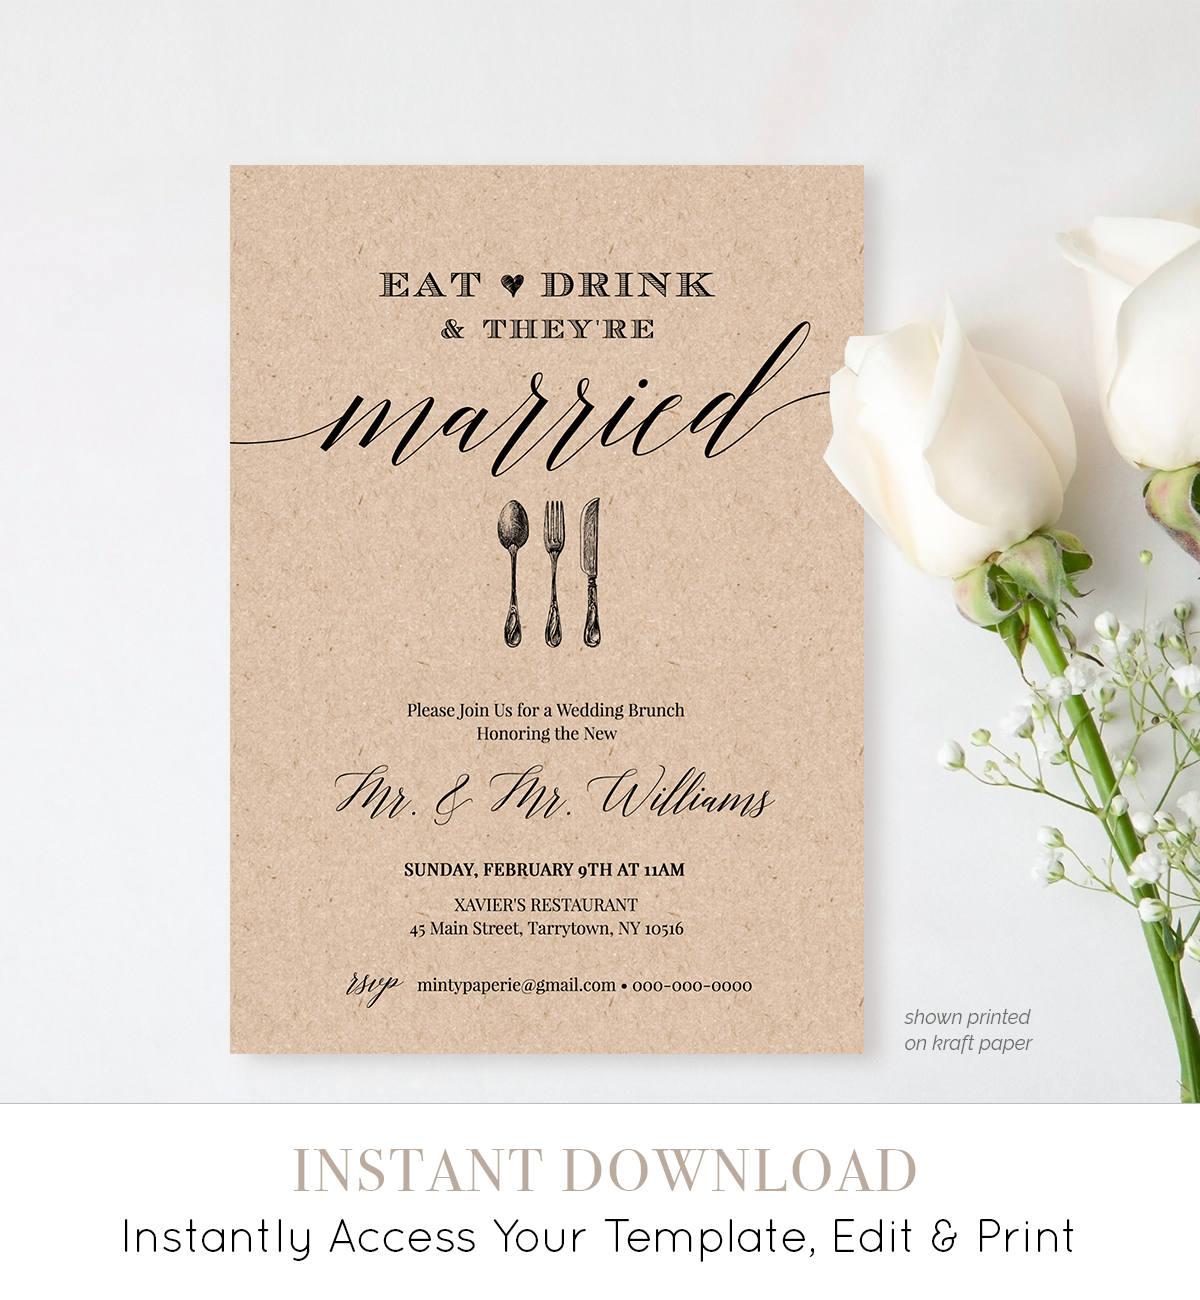 Post Wedding Brunch Invitation Template, Printable Brunch Invite ...